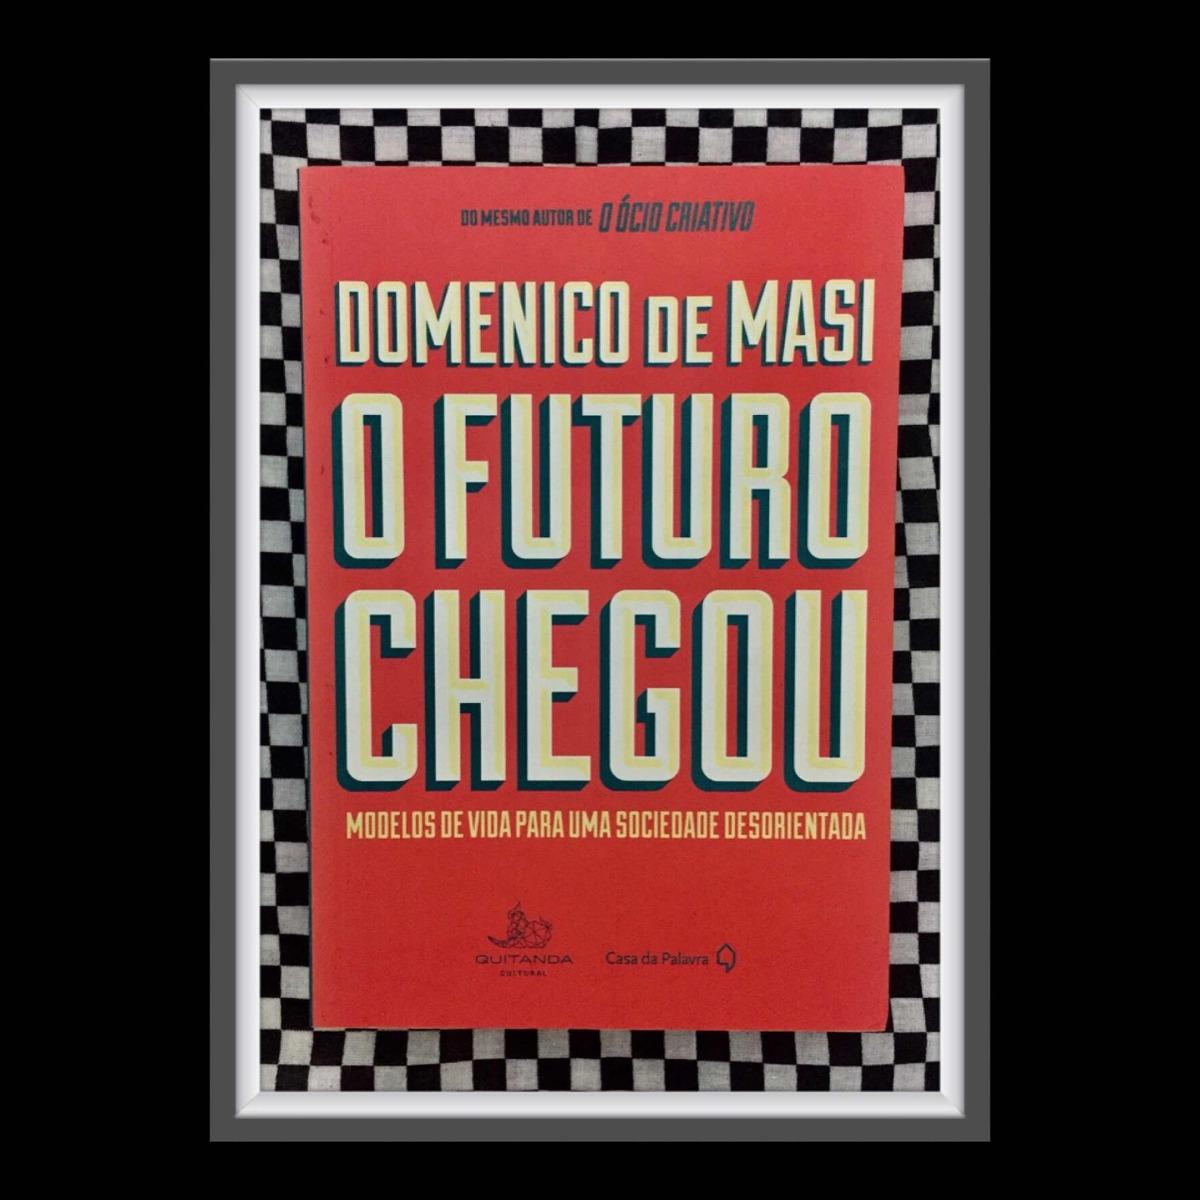 O FUTURO CHEGOU DOMENICO DE MASI EPUB